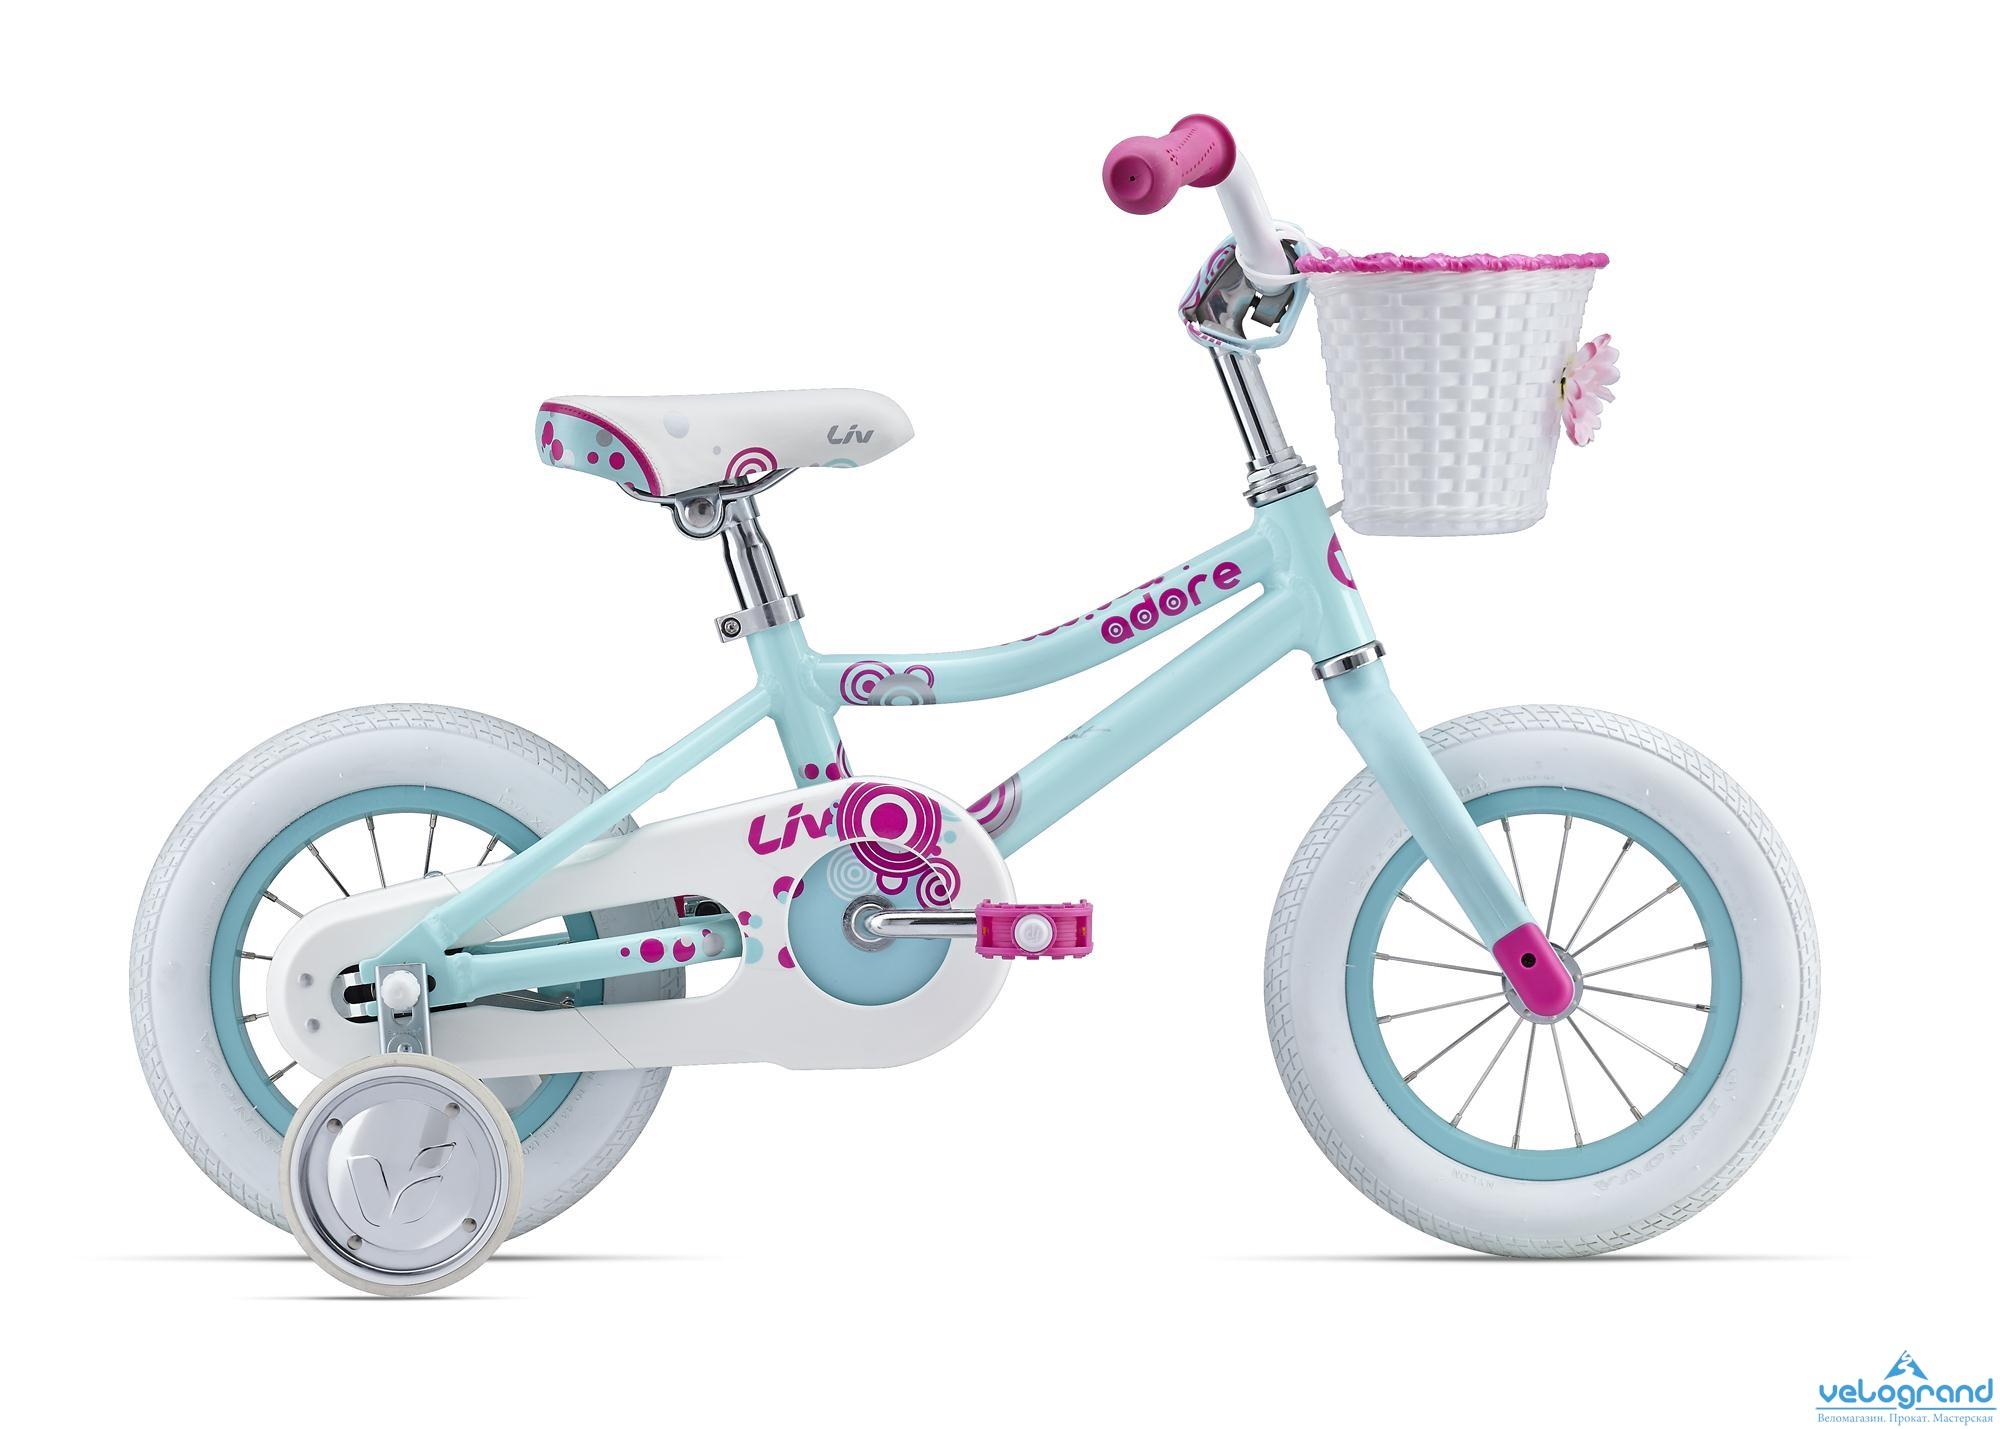 Детский велосипед Giant Adore C/B 12 (2016) от Velogrand